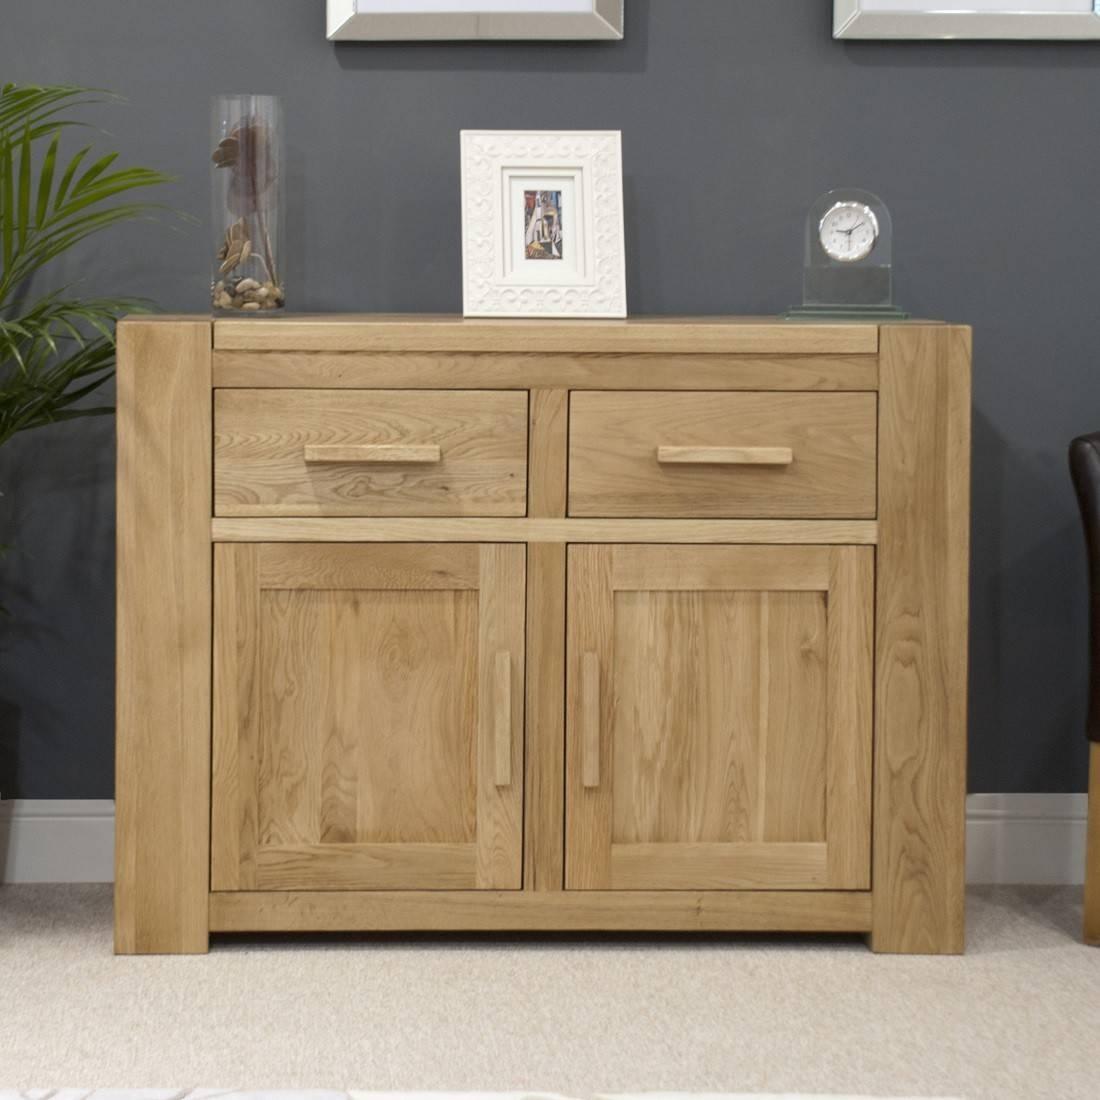 Oak Sideboards | Oak Furniture Uk Pertaining To Real Wood Sideboards (View 6 of 15)